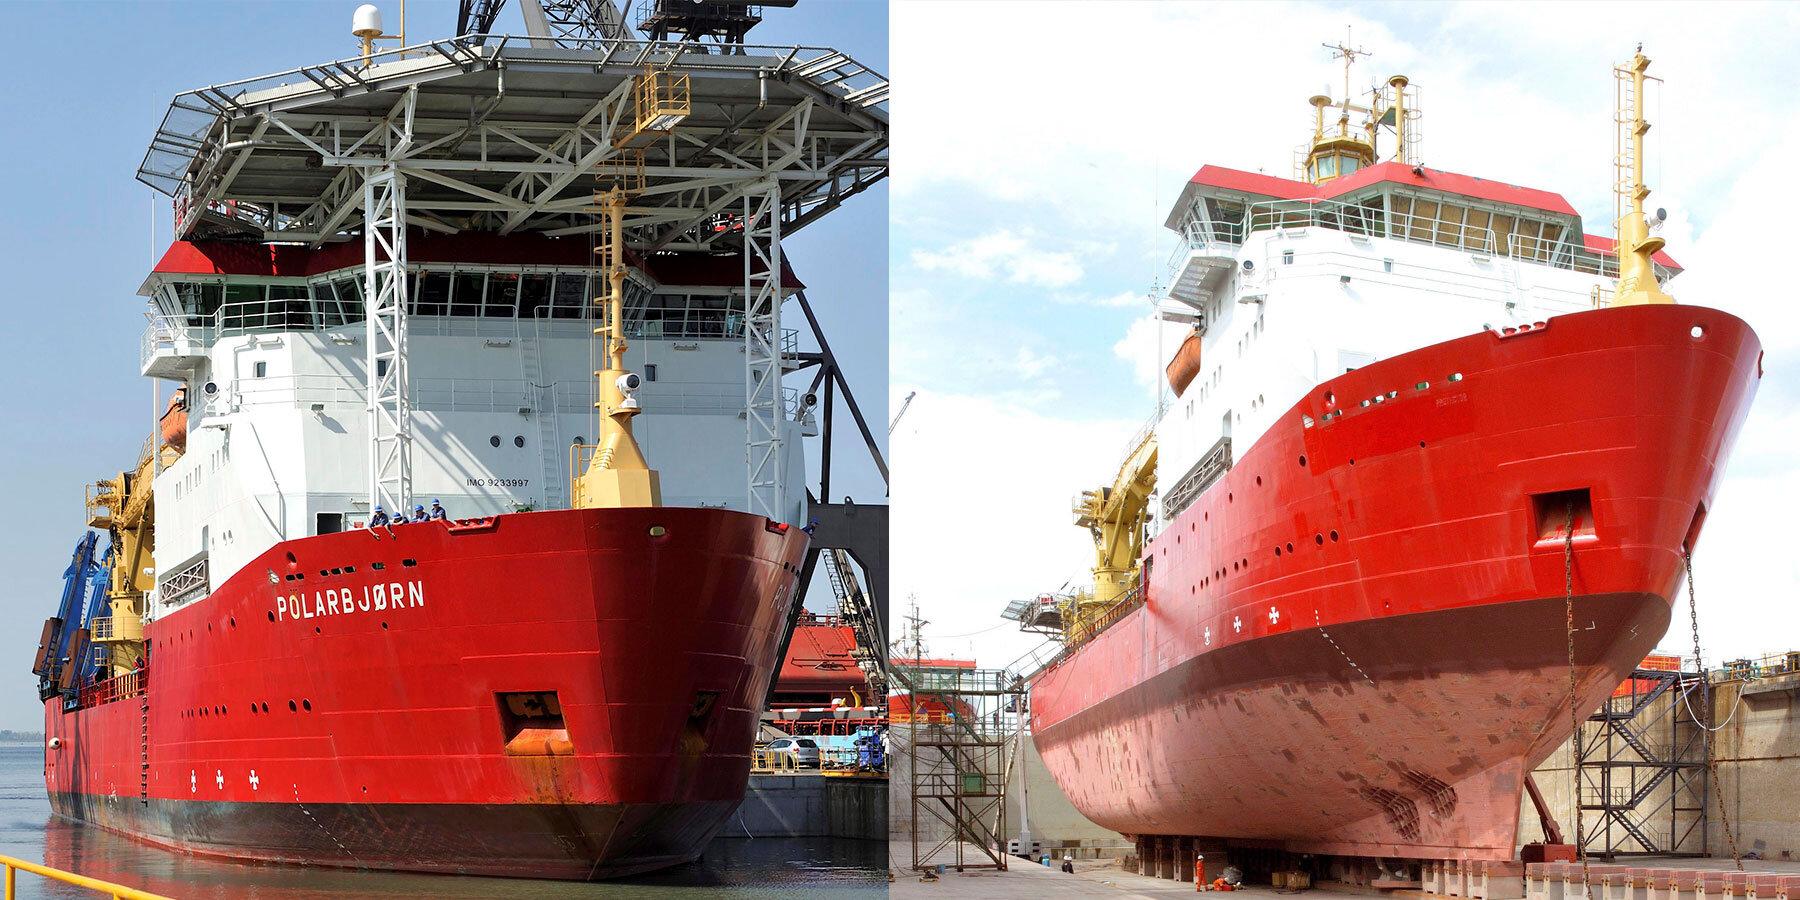 MV Polar Bjorn HMS Protector